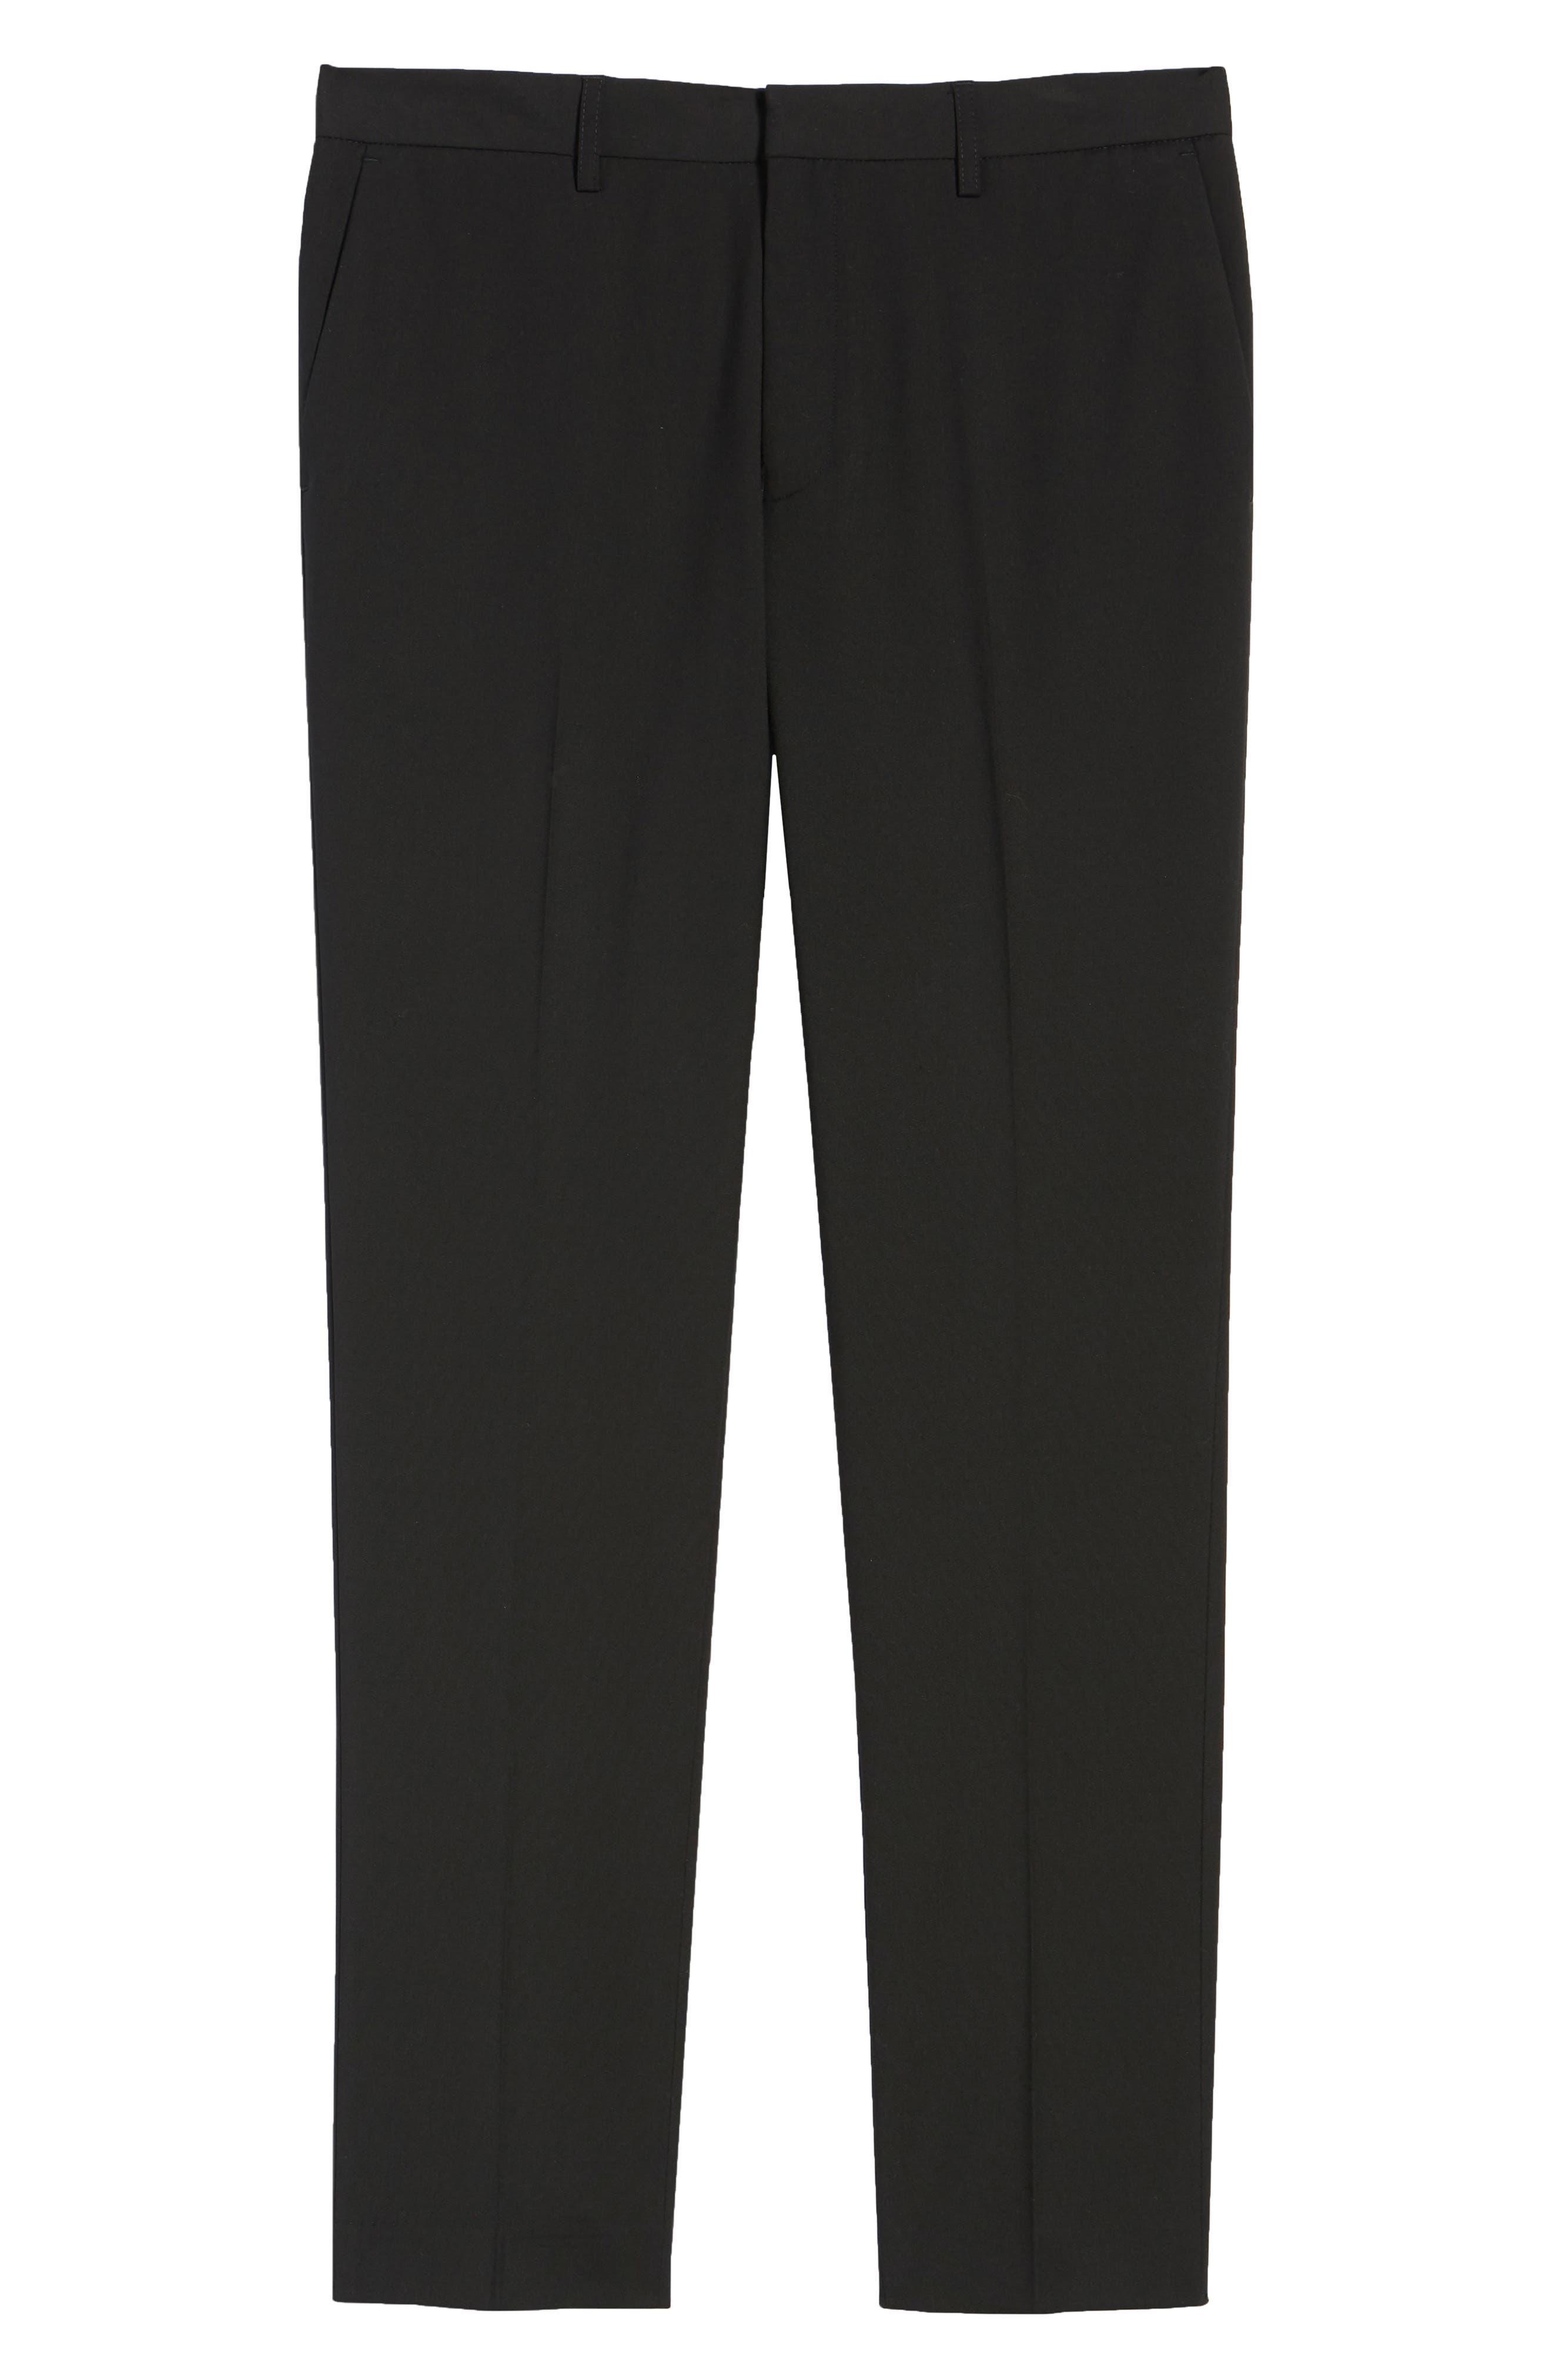 Skinny Fit Suit Pants,                             Alternate thumbnail 6, color,                             Black